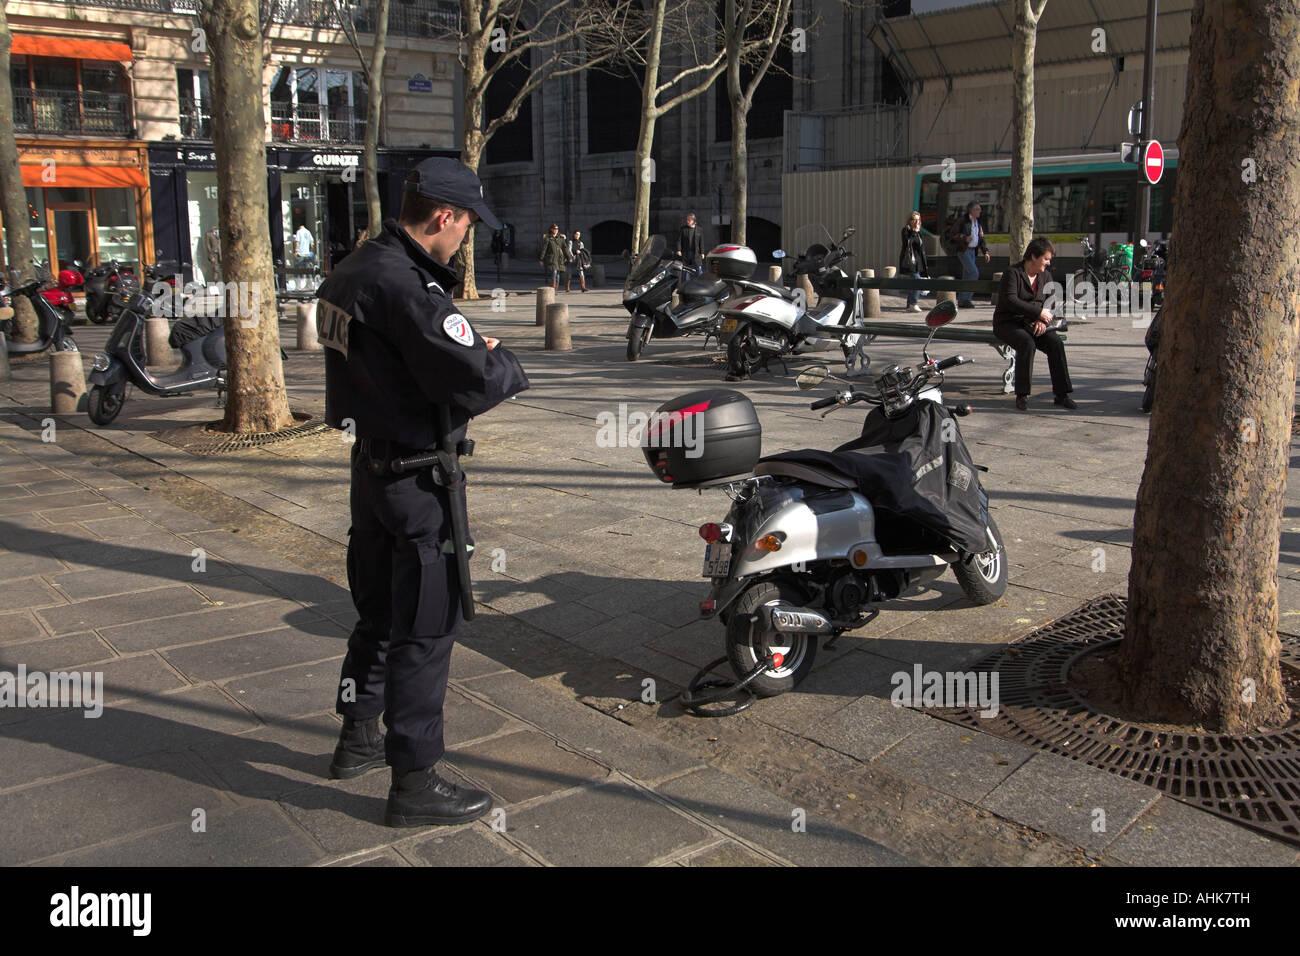 paris france traffic cop gendarme writes parking ticket for scooter stock photo royalty free. Black Bedroom Furniture Sets. Home Design Ideas